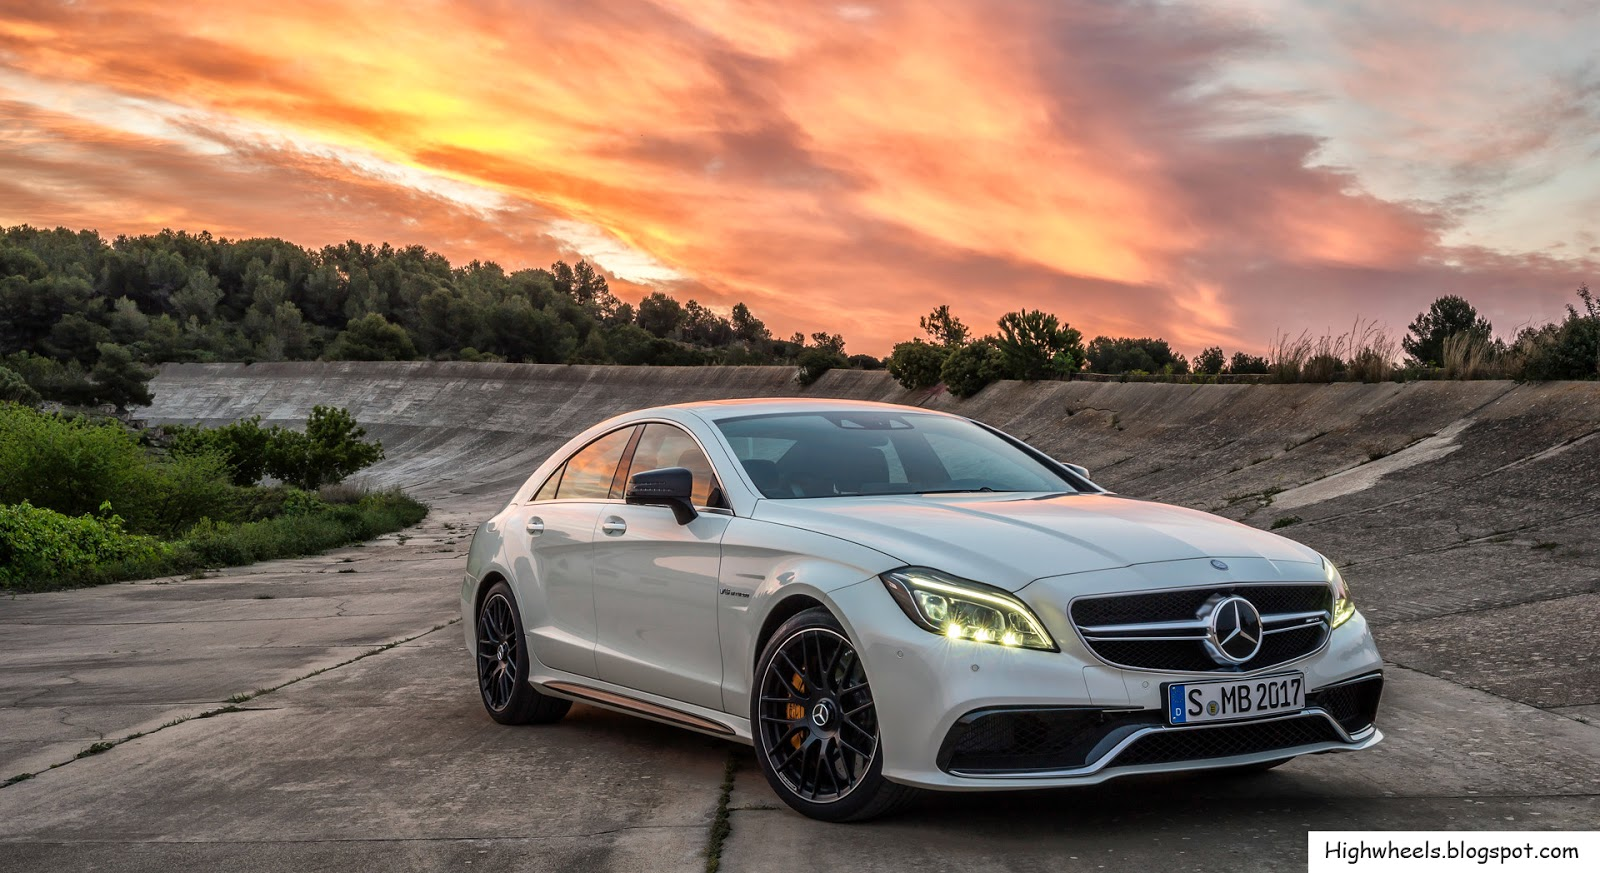 All Types cls mercedes 2015 : High Wheels: 2015 Mercedes-Benz CLS 63 AMG